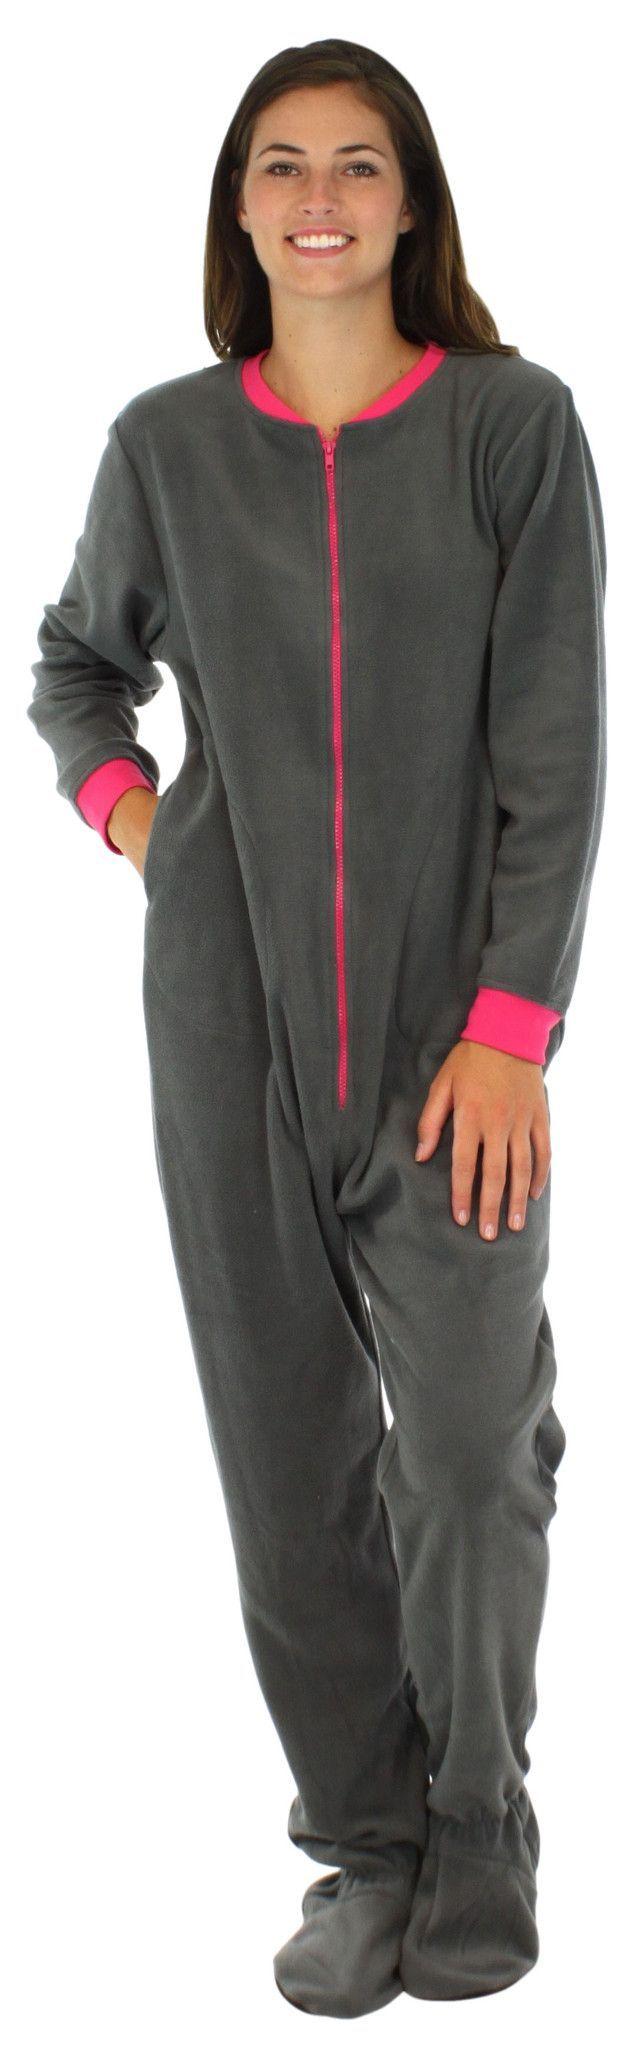 Adult Footed Fleece Pajamas